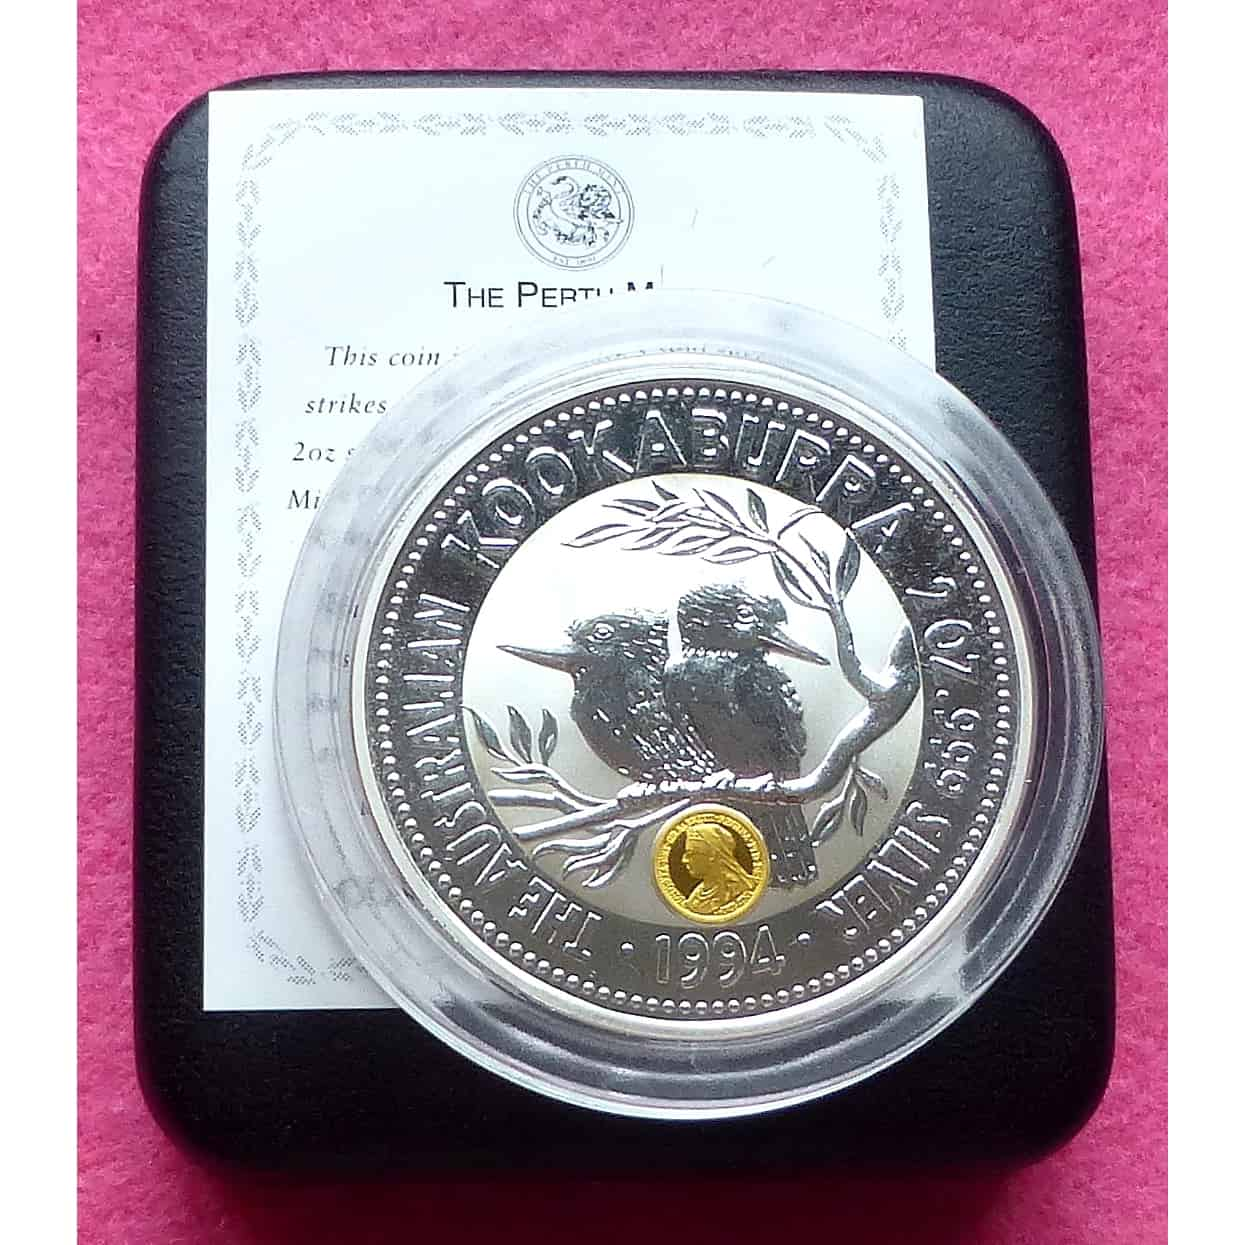 Perth Mint 1994 $1 Kookaburra 1oz silver Australian Coin